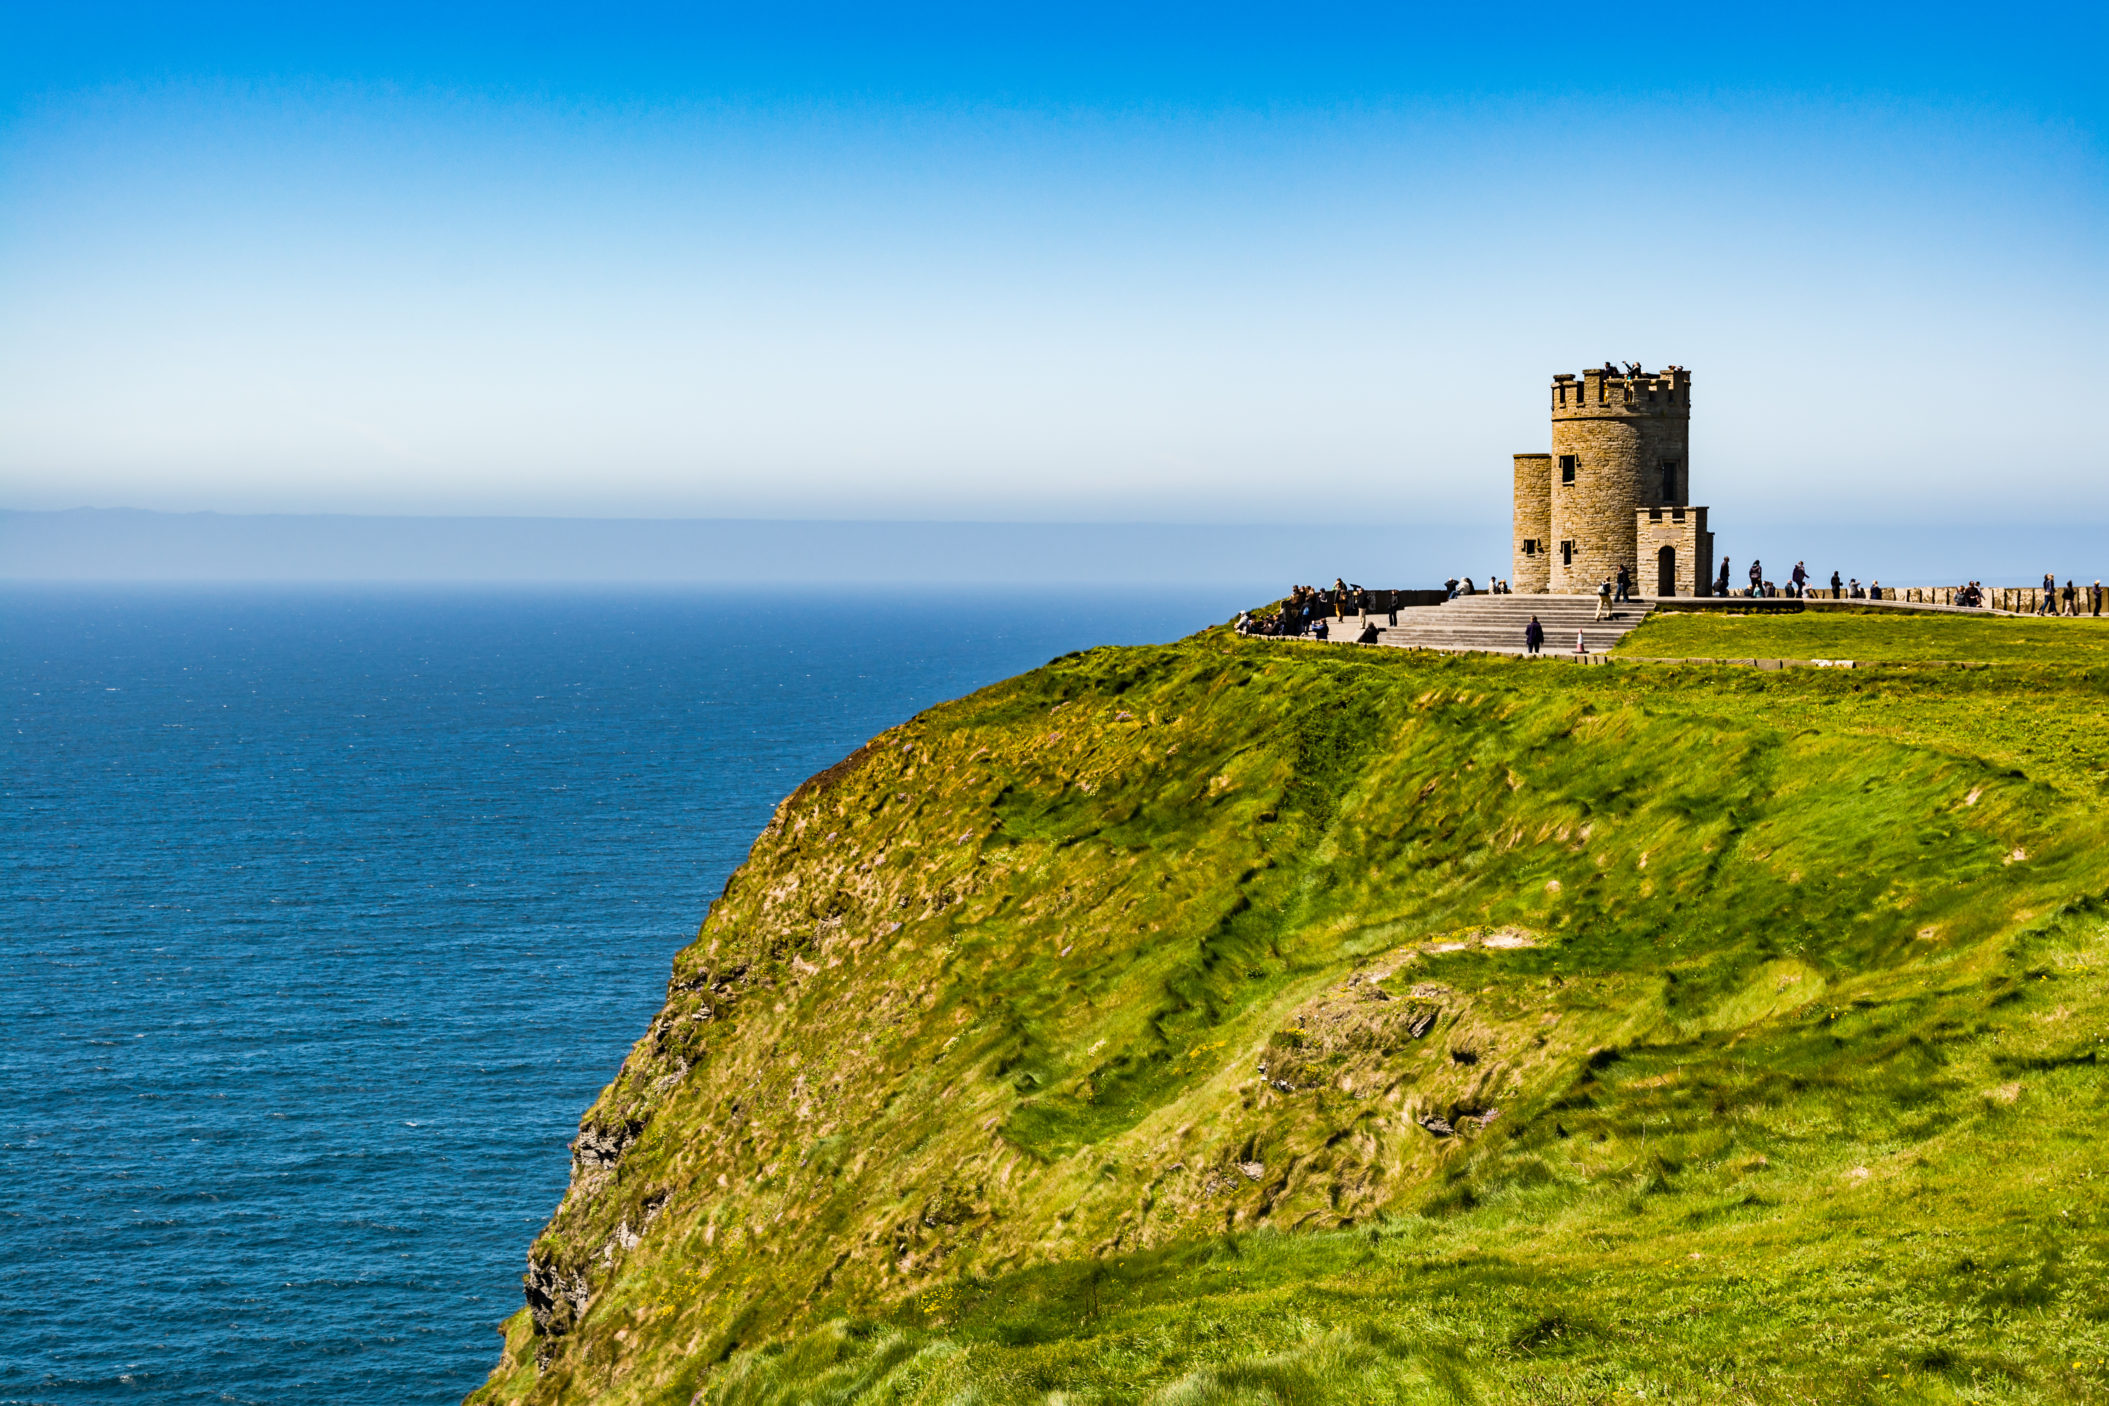 Ireland [Shutterstock]